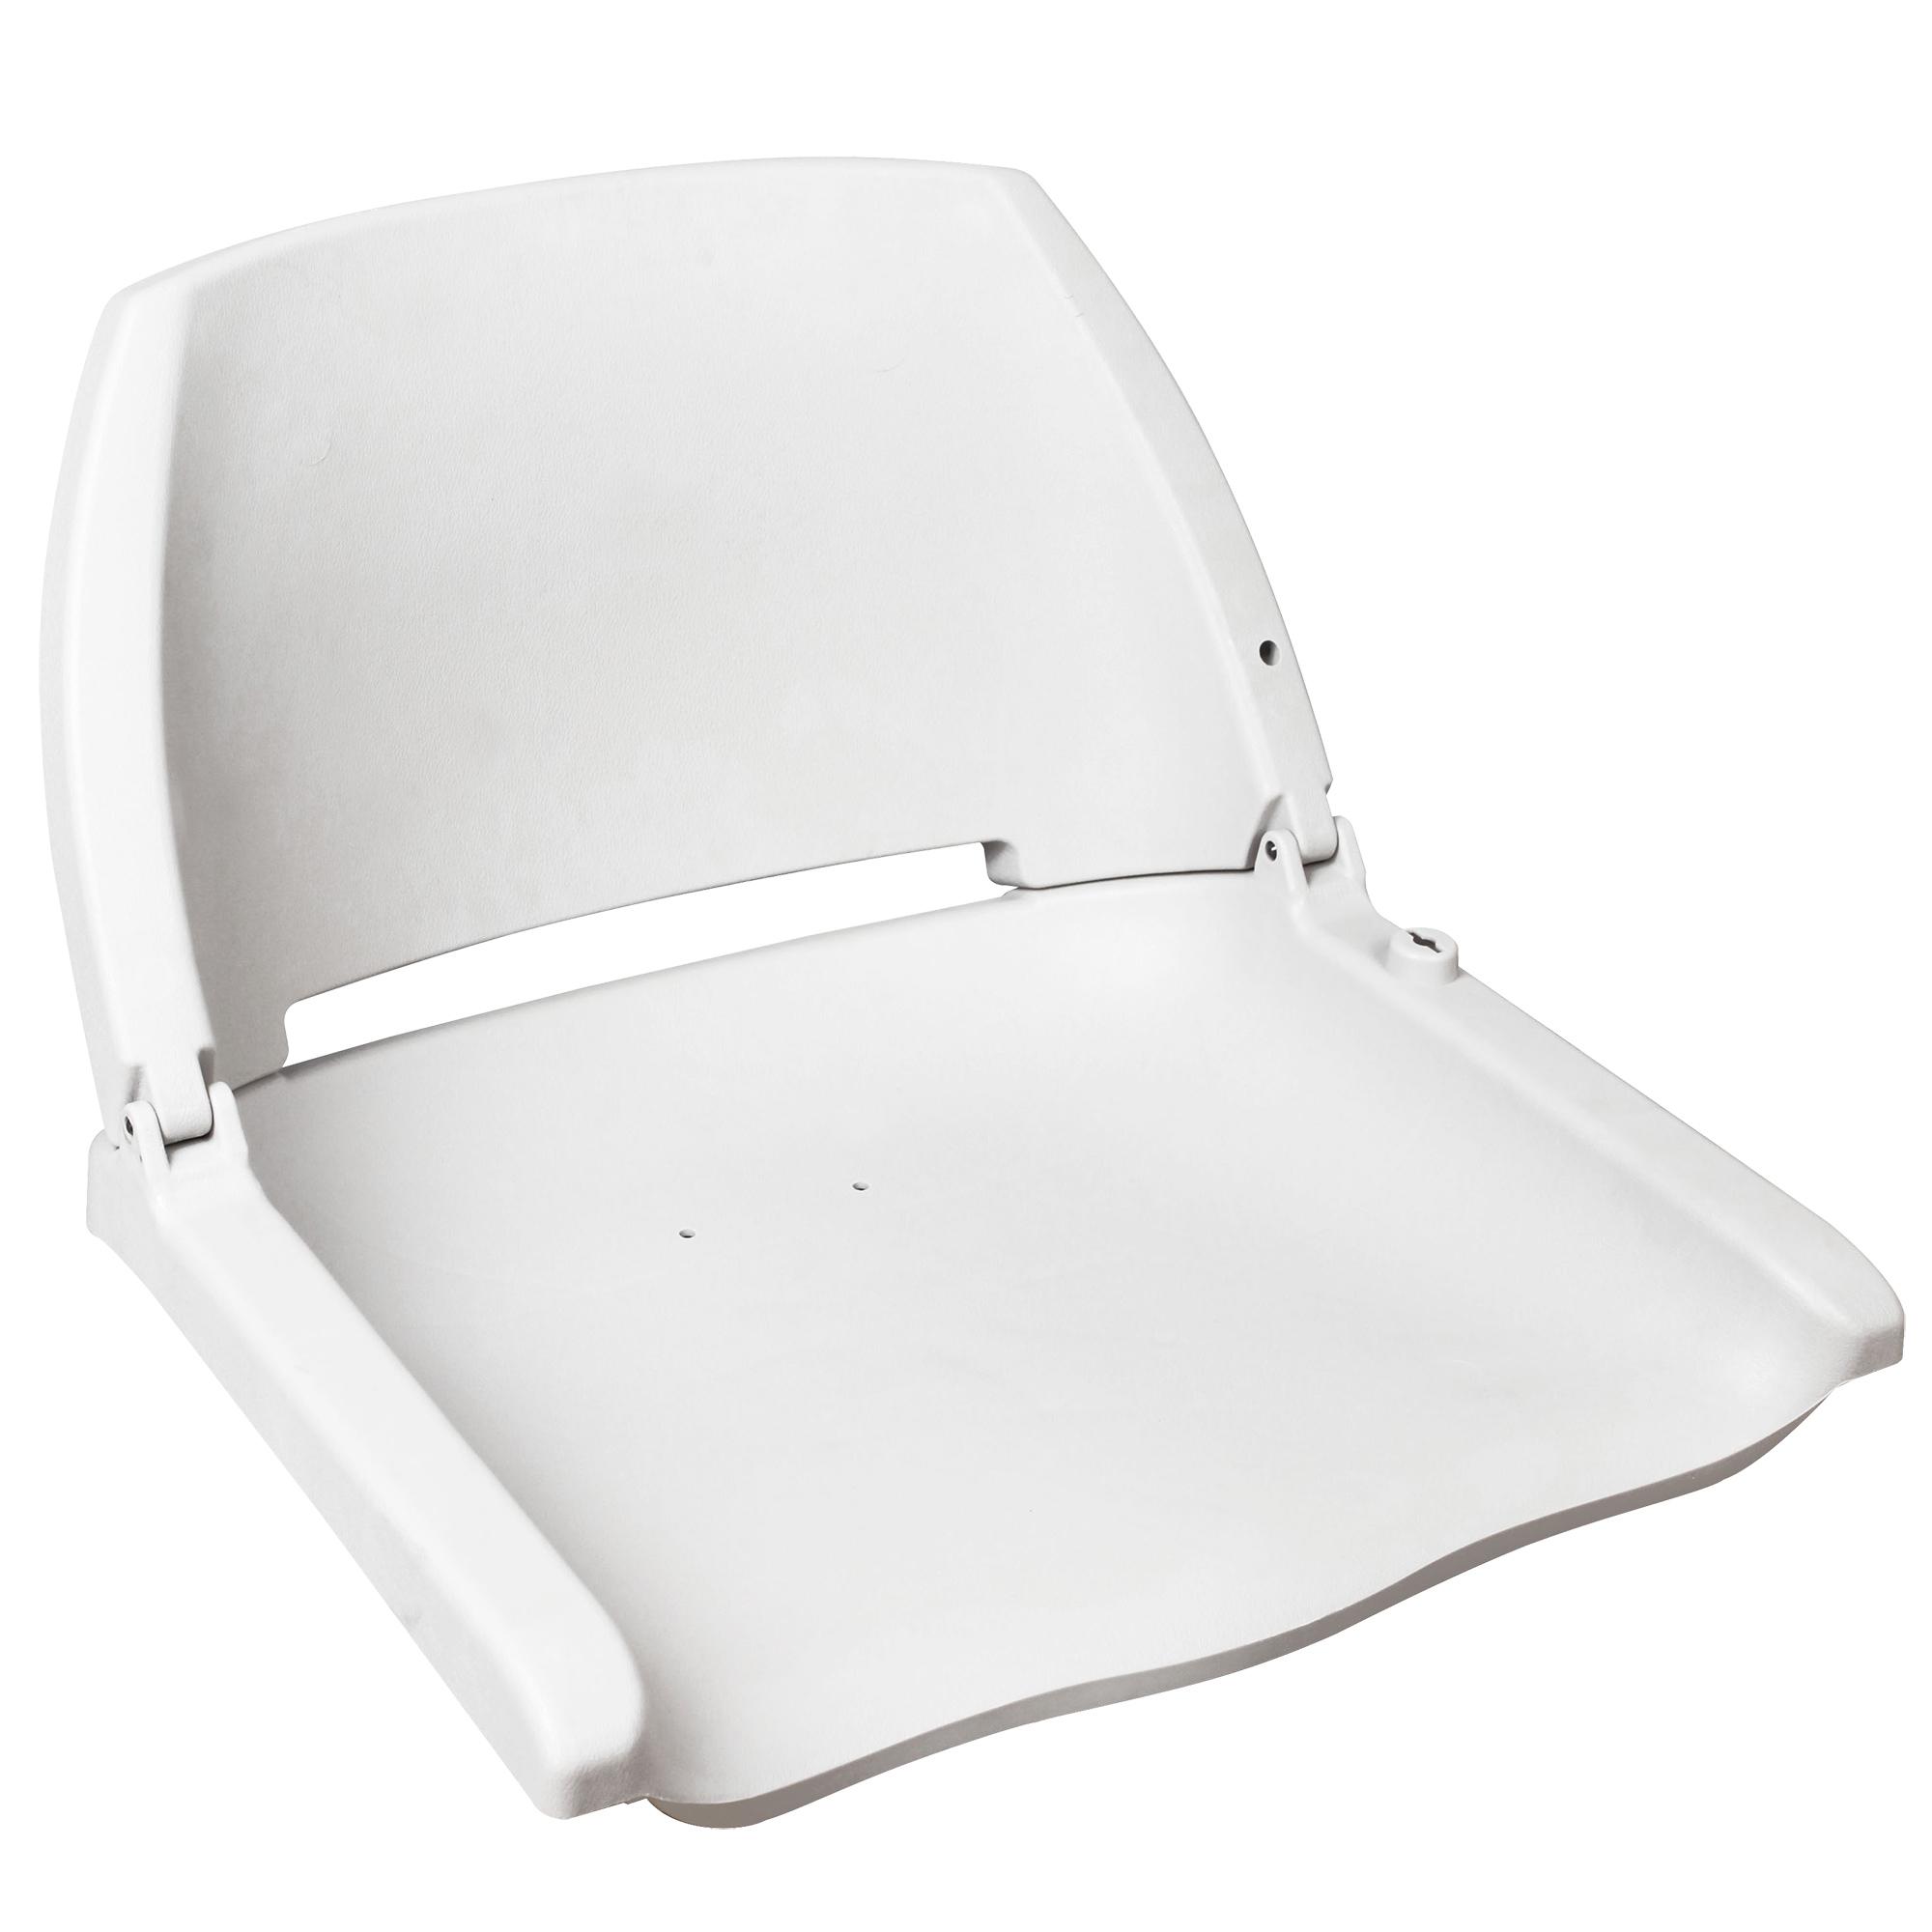 Boat Seat Stool : Pro tec boat seat helm fishing stool folding white